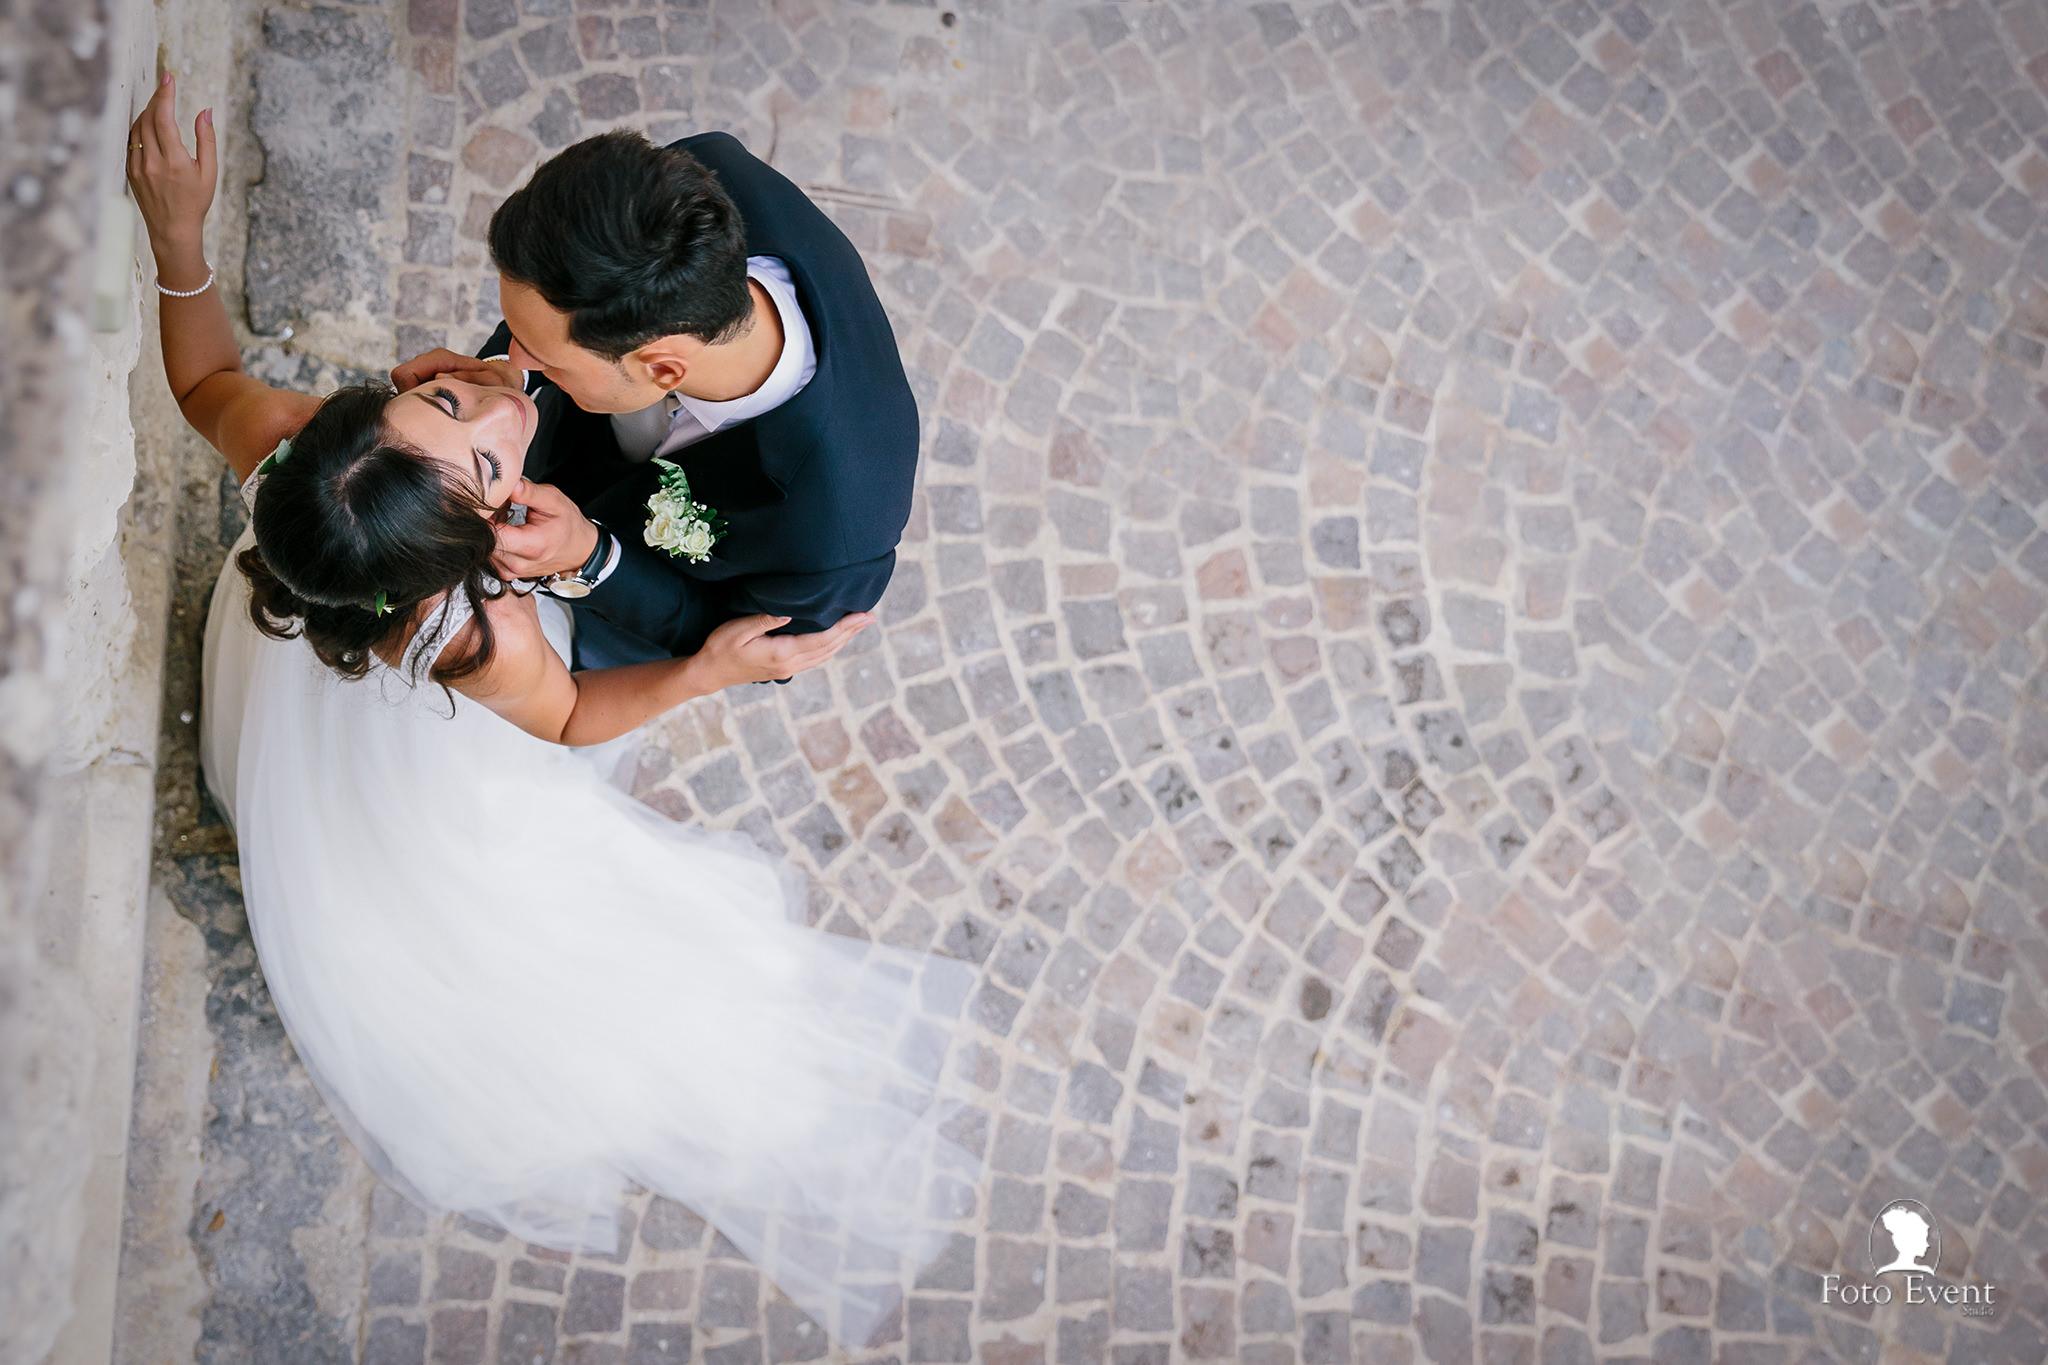 035-2019-08-23-Matrimonio-Lucia-e-Rosario-Scopelliti-5DE-1713